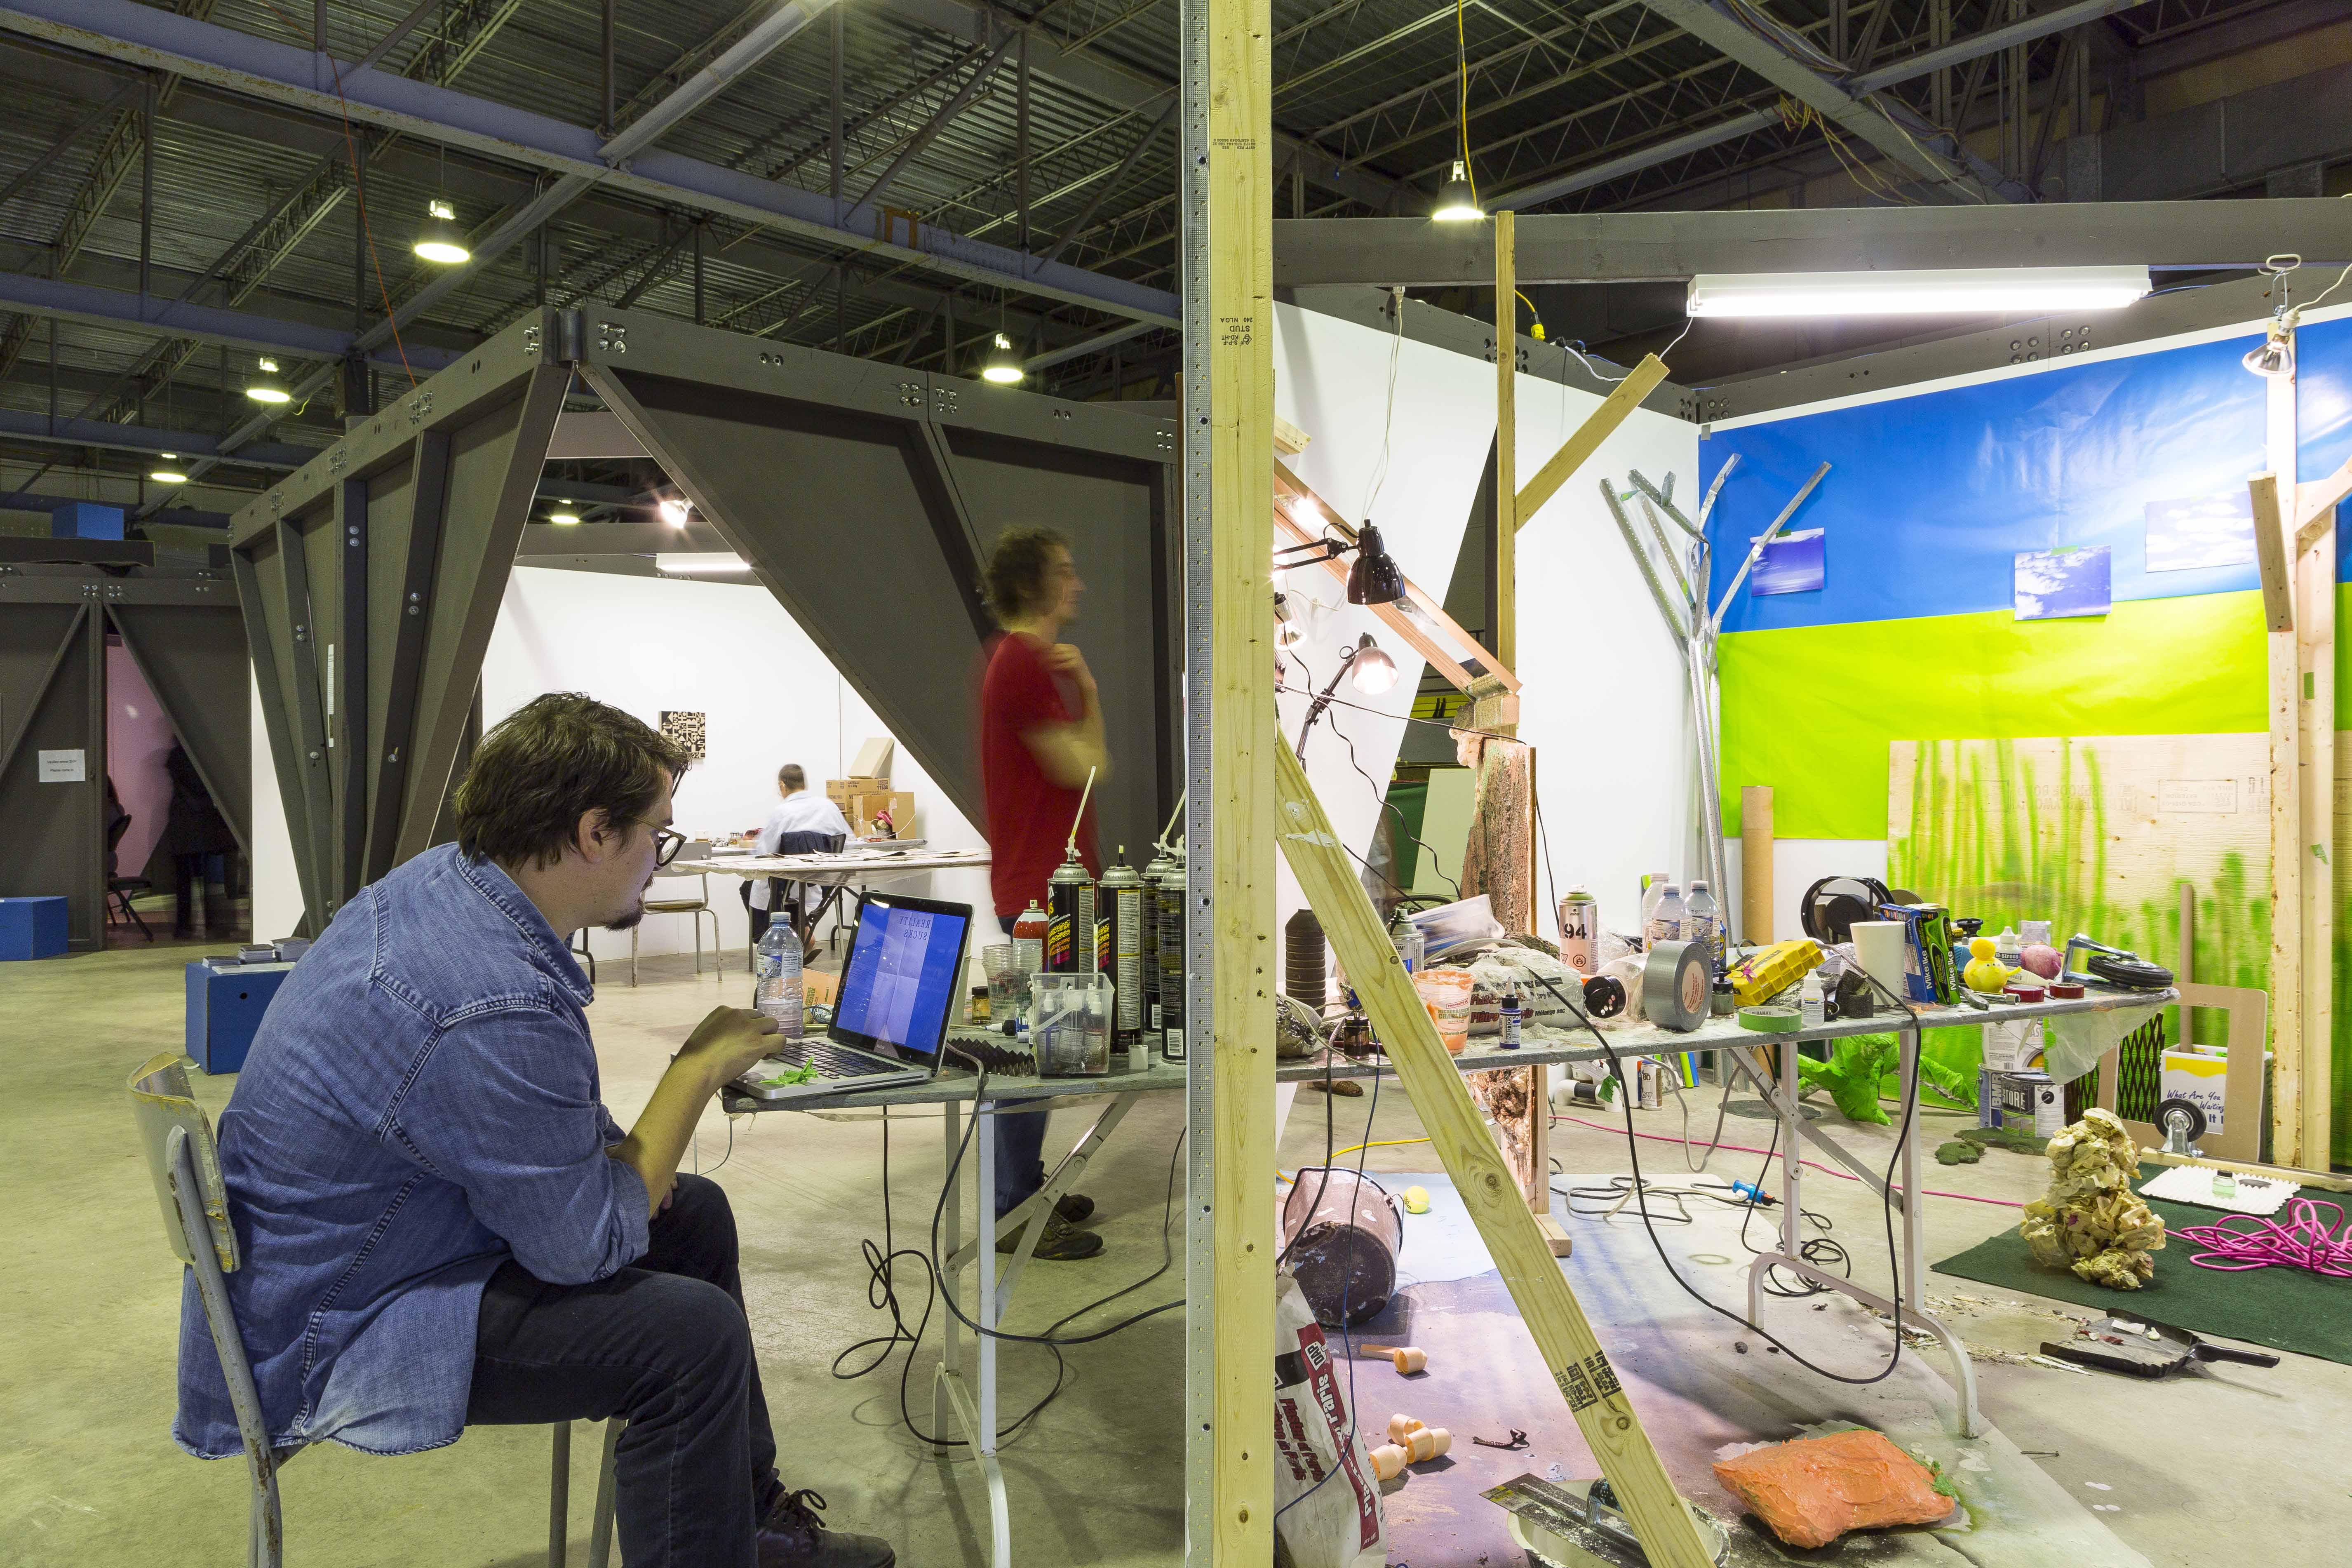 06_Mathieu Cardin_33e Symposium international d'art contemporain_Photo René Bouchard_BR